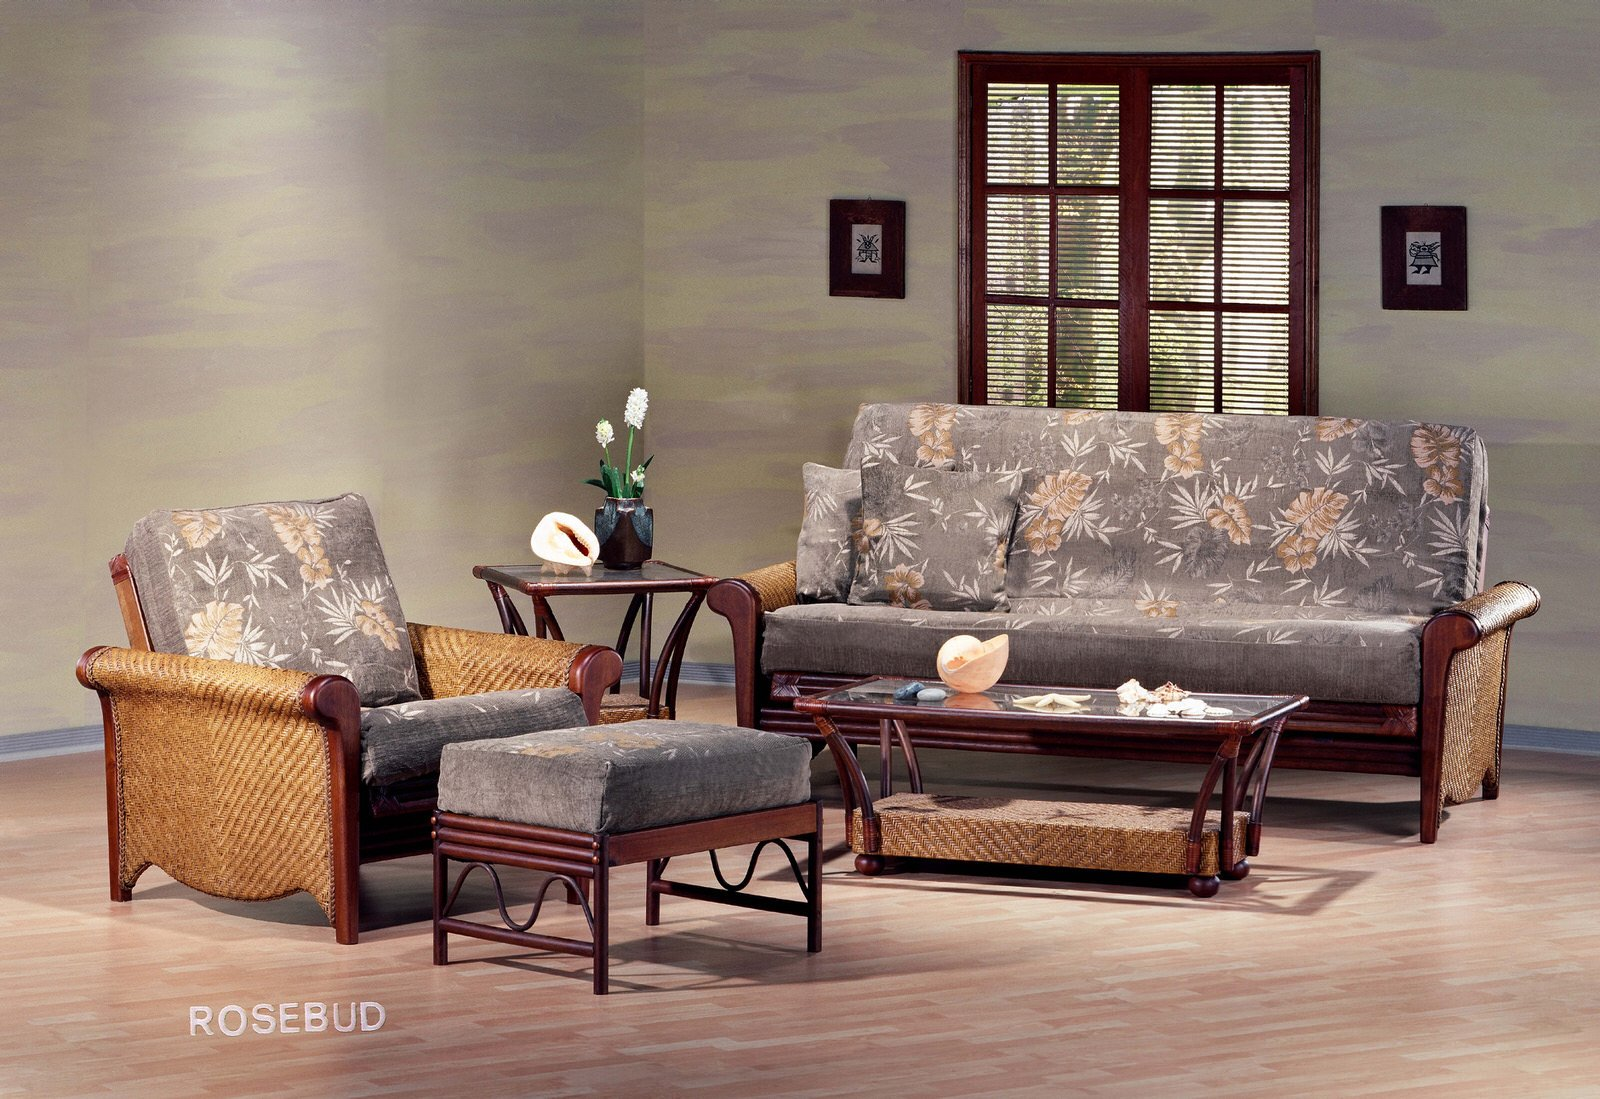 Rosebud Rattan Futon Frame By Night Day Furniture